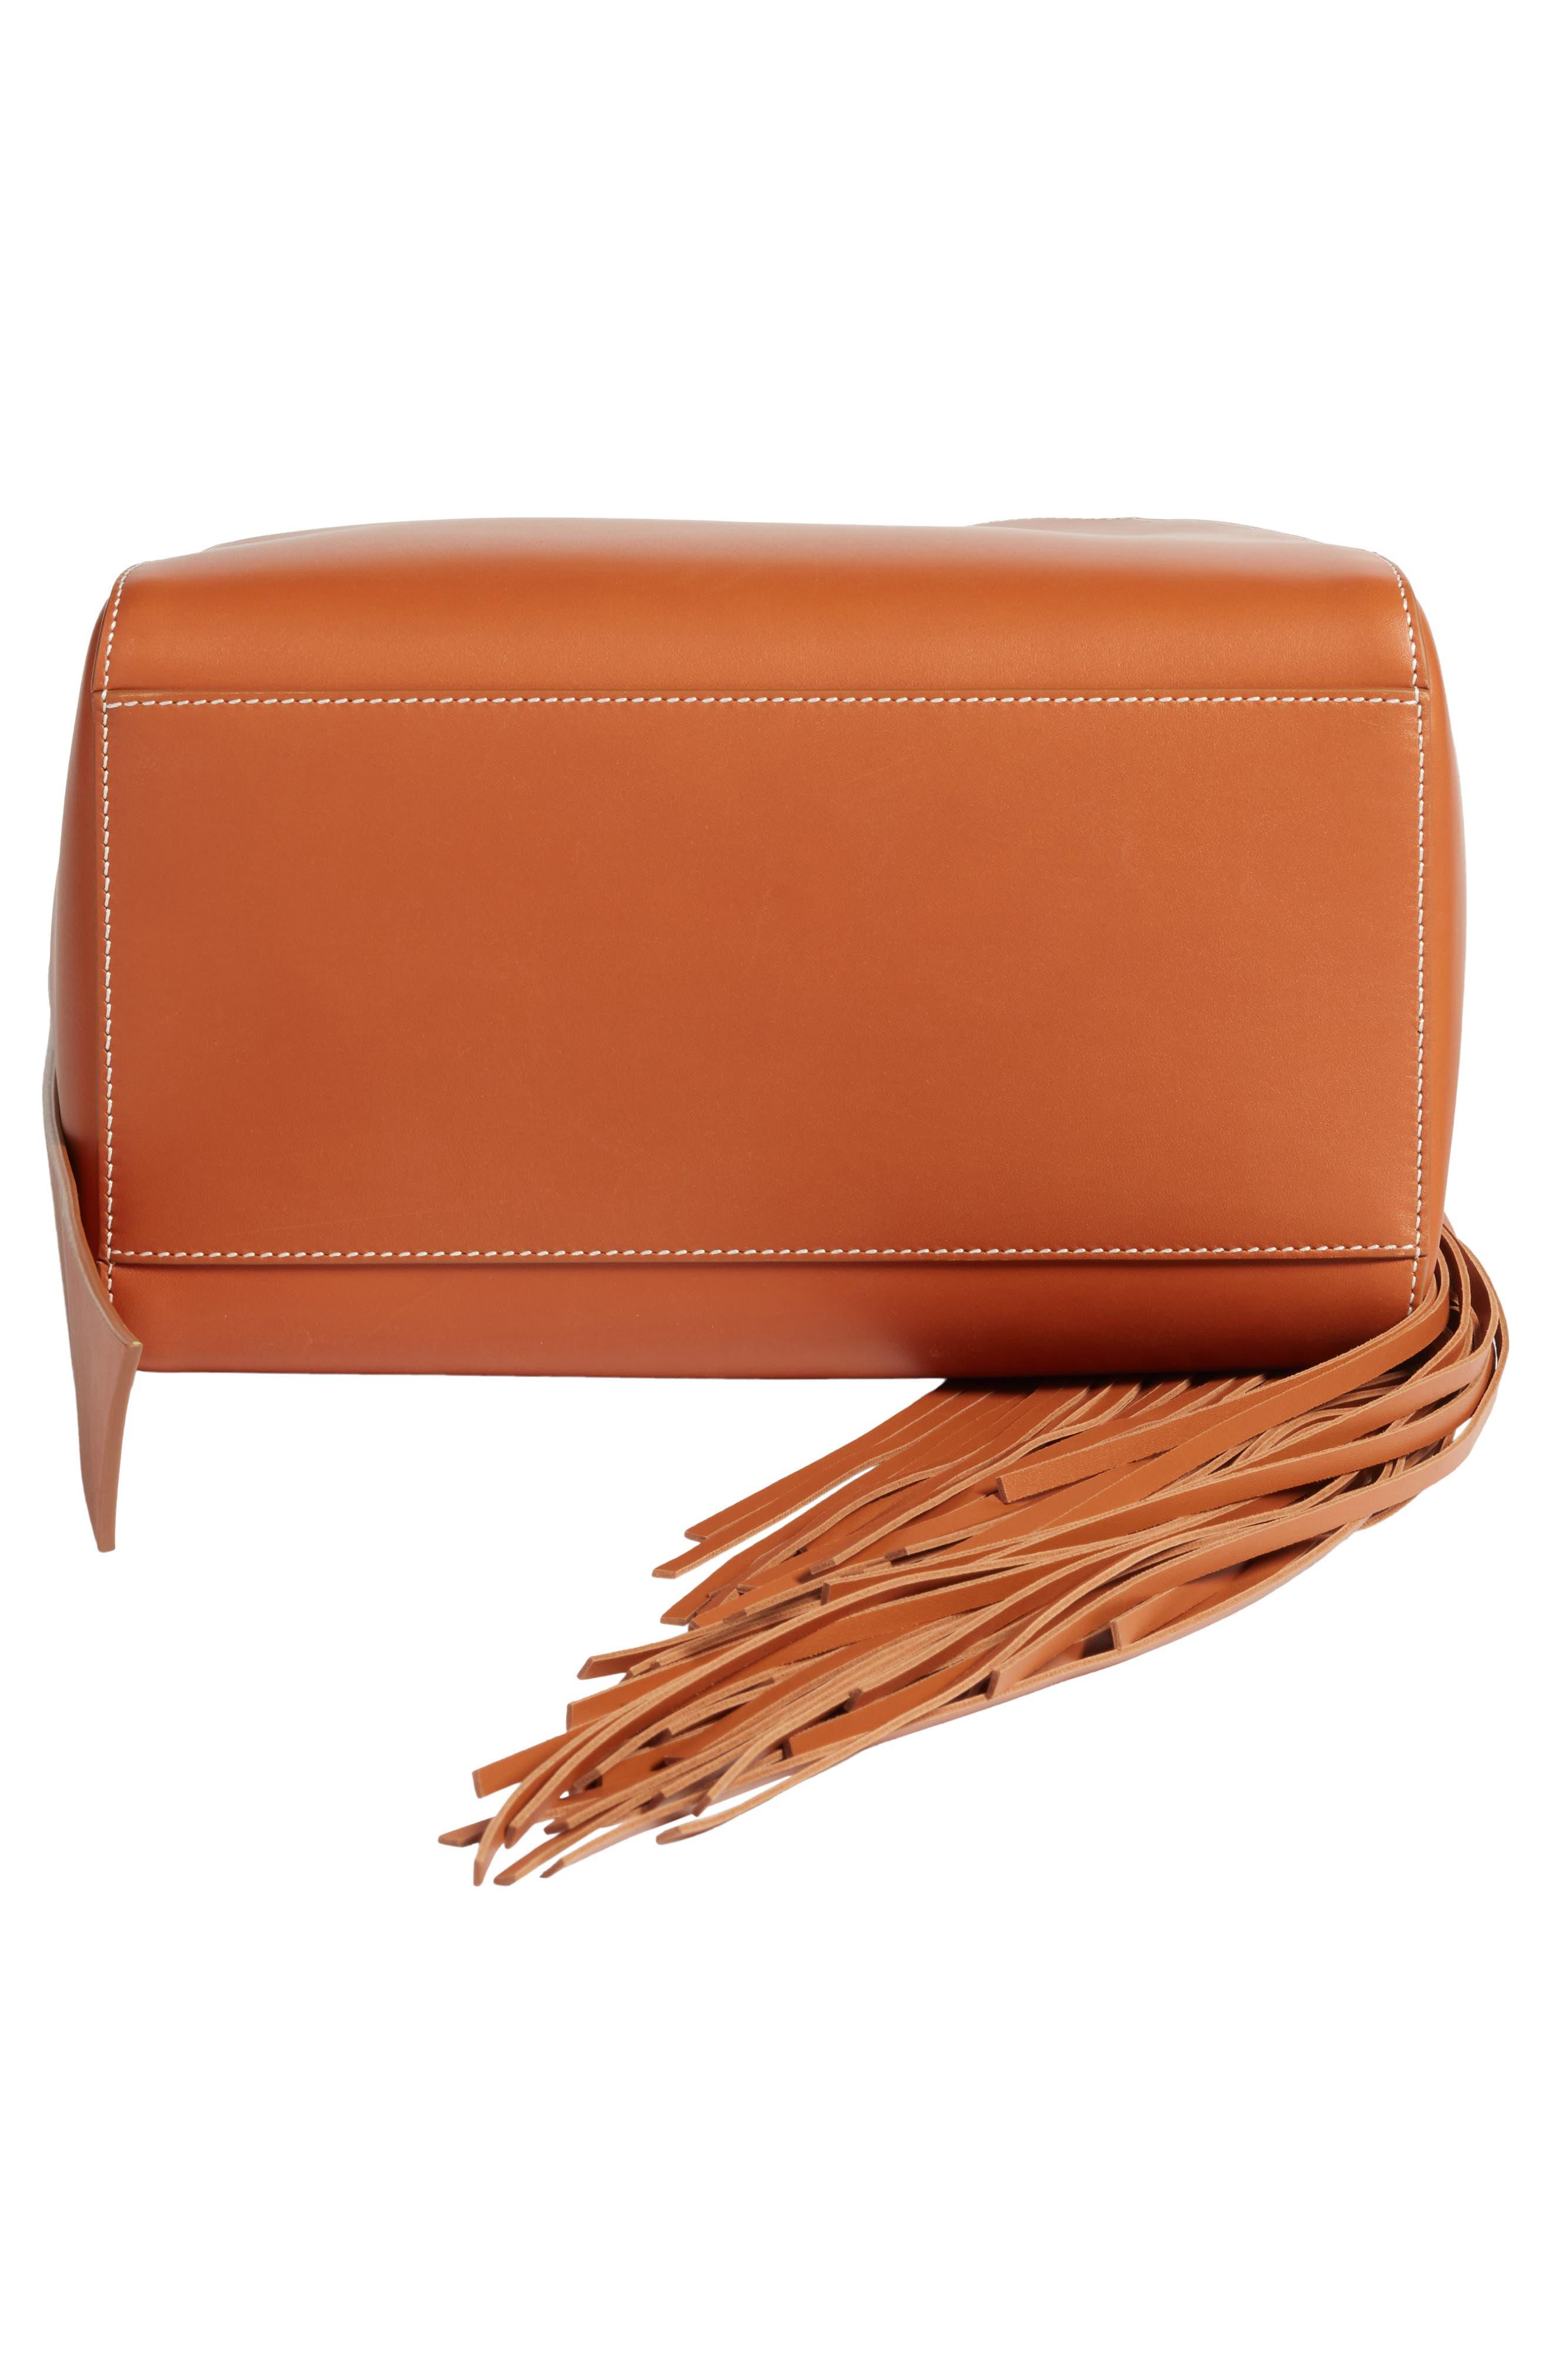 Fringe Leather Bucket Bag,                             Alternate thumbnail 5, color,                             COGNAC